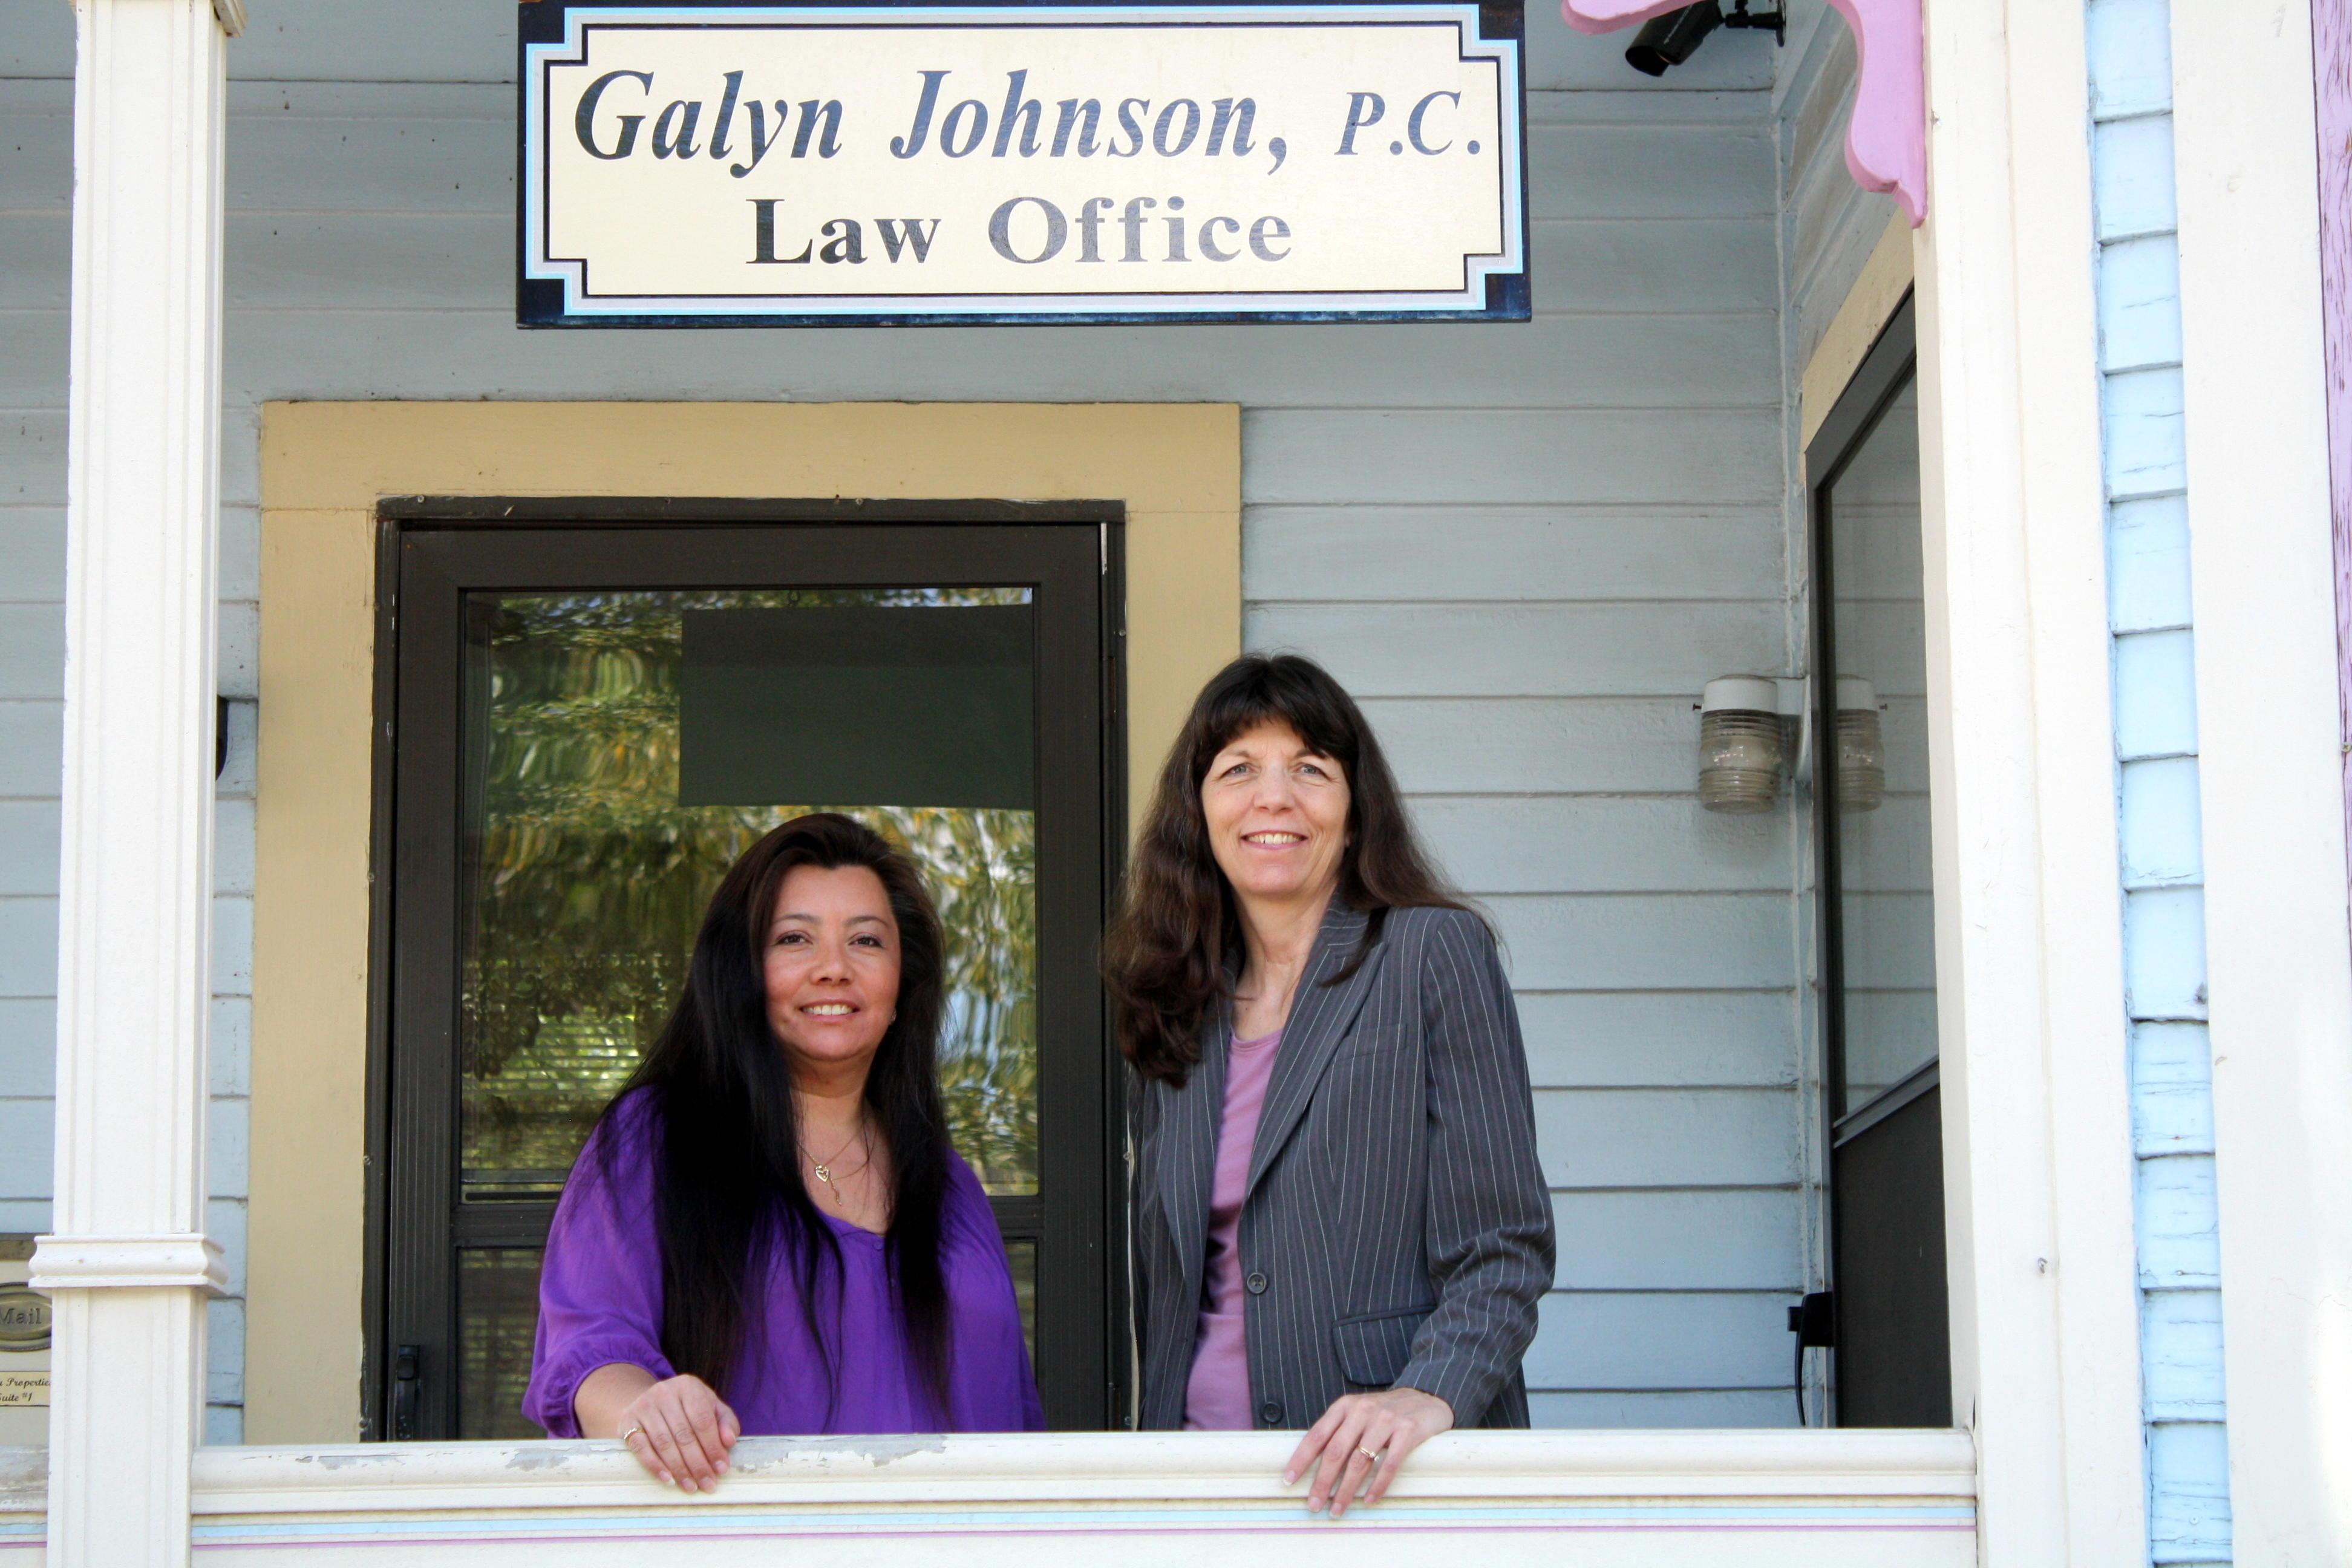 Galyn Johnson, P.C.